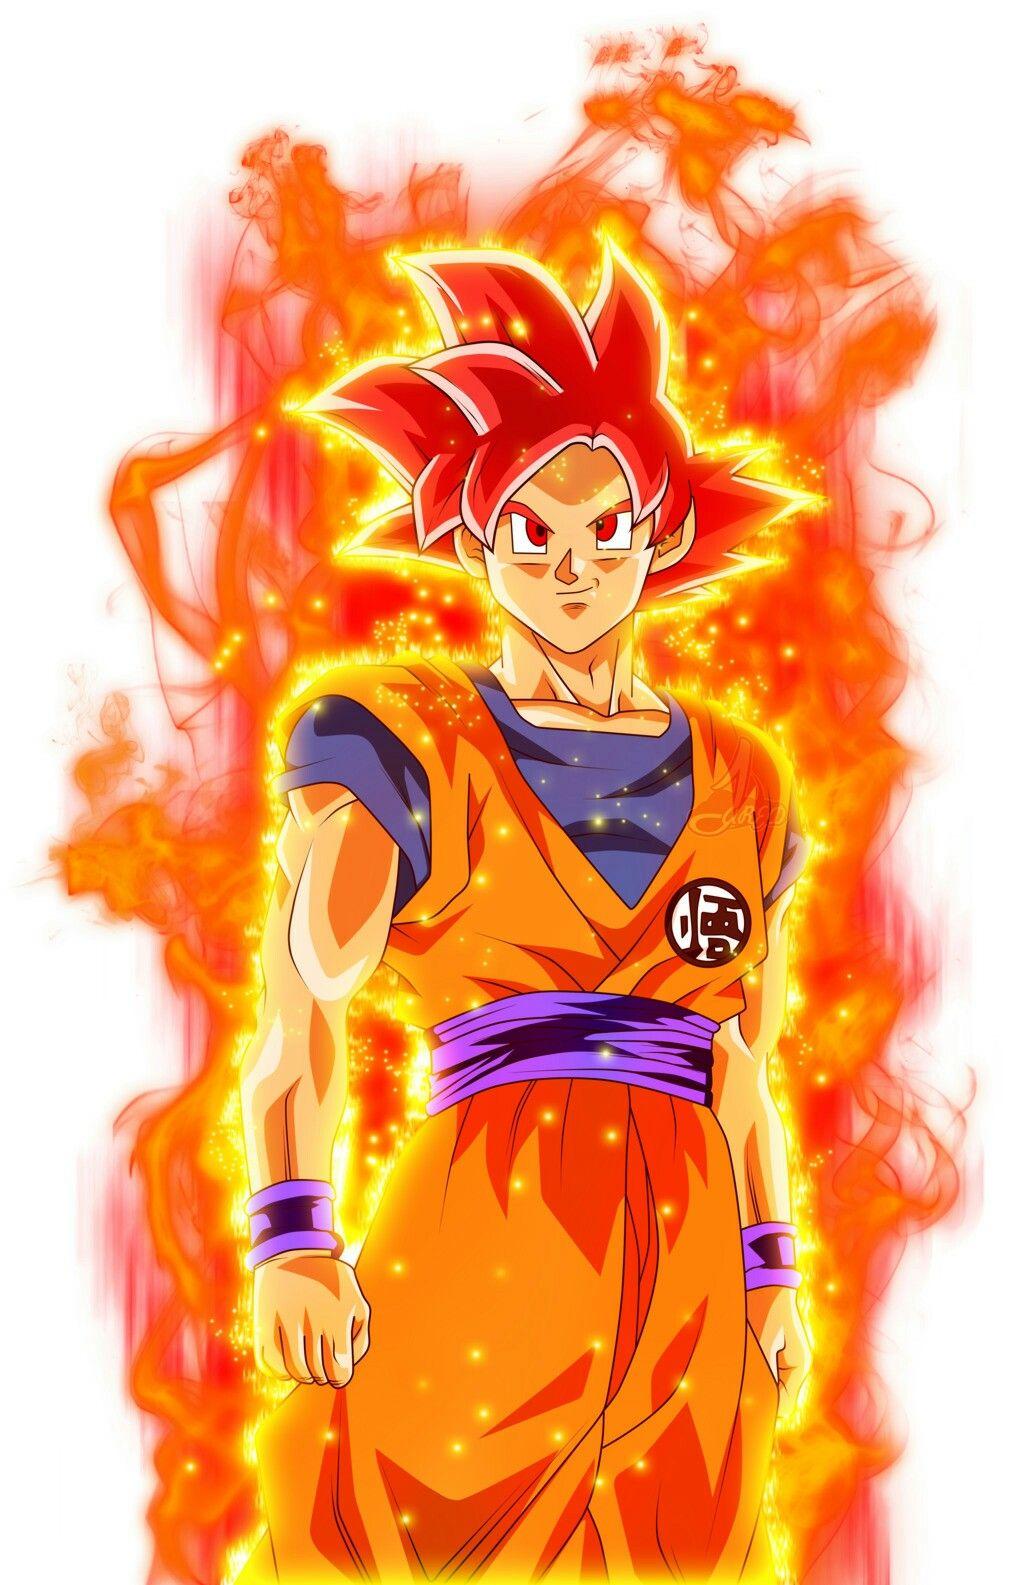 Goku ssj god universo 7 goku goku dragones goku - Foto goku super saiyan god ...